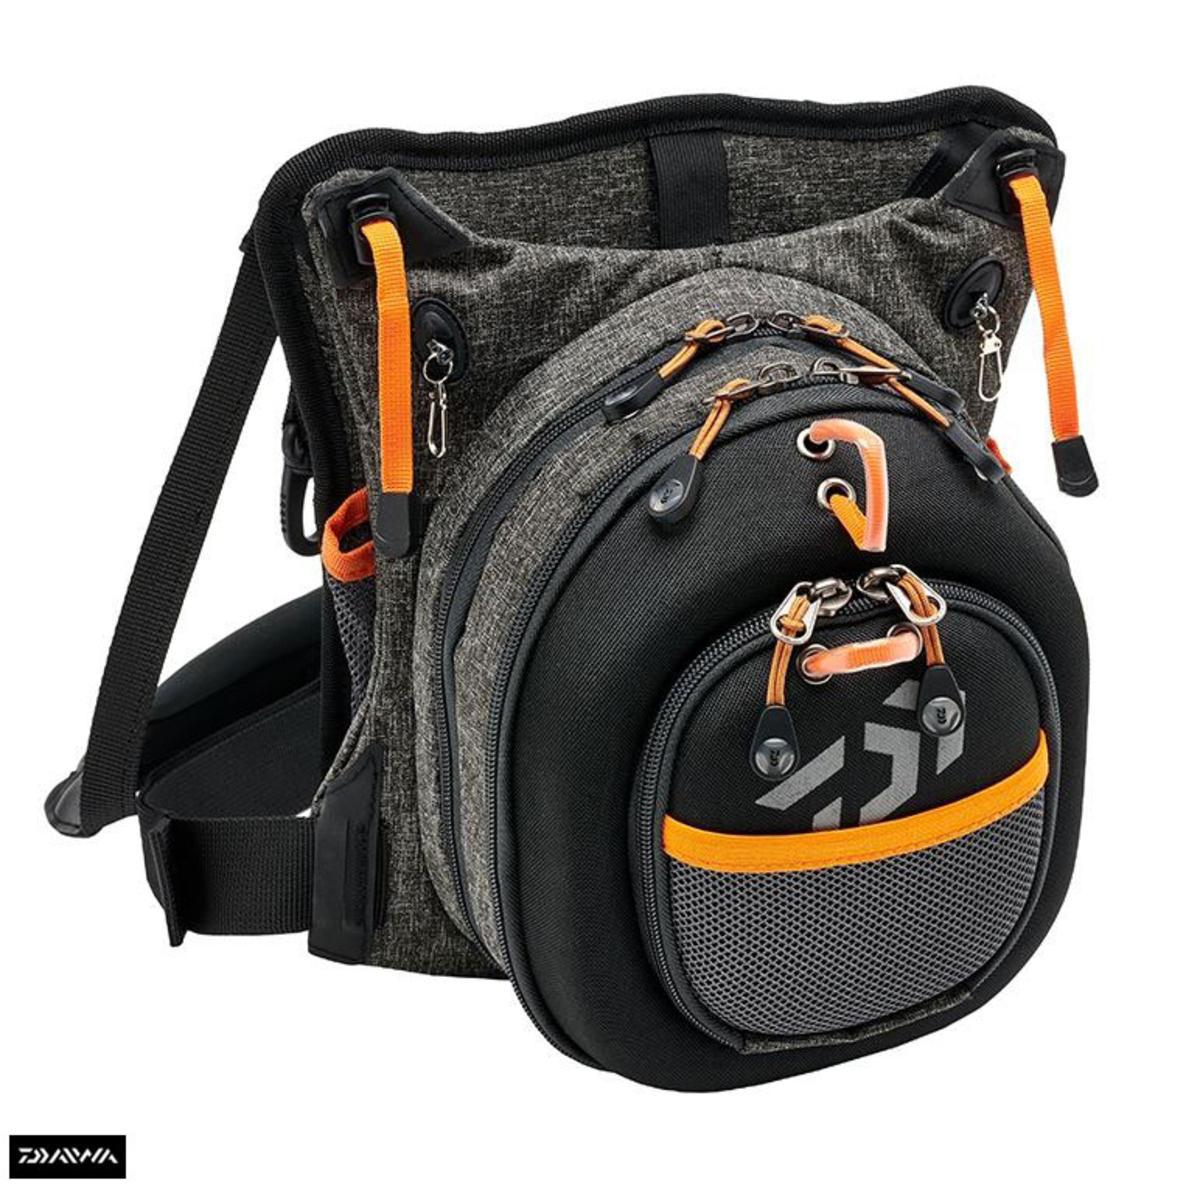 New Daiwa Chest Pack / Fishing Bag - DCP1